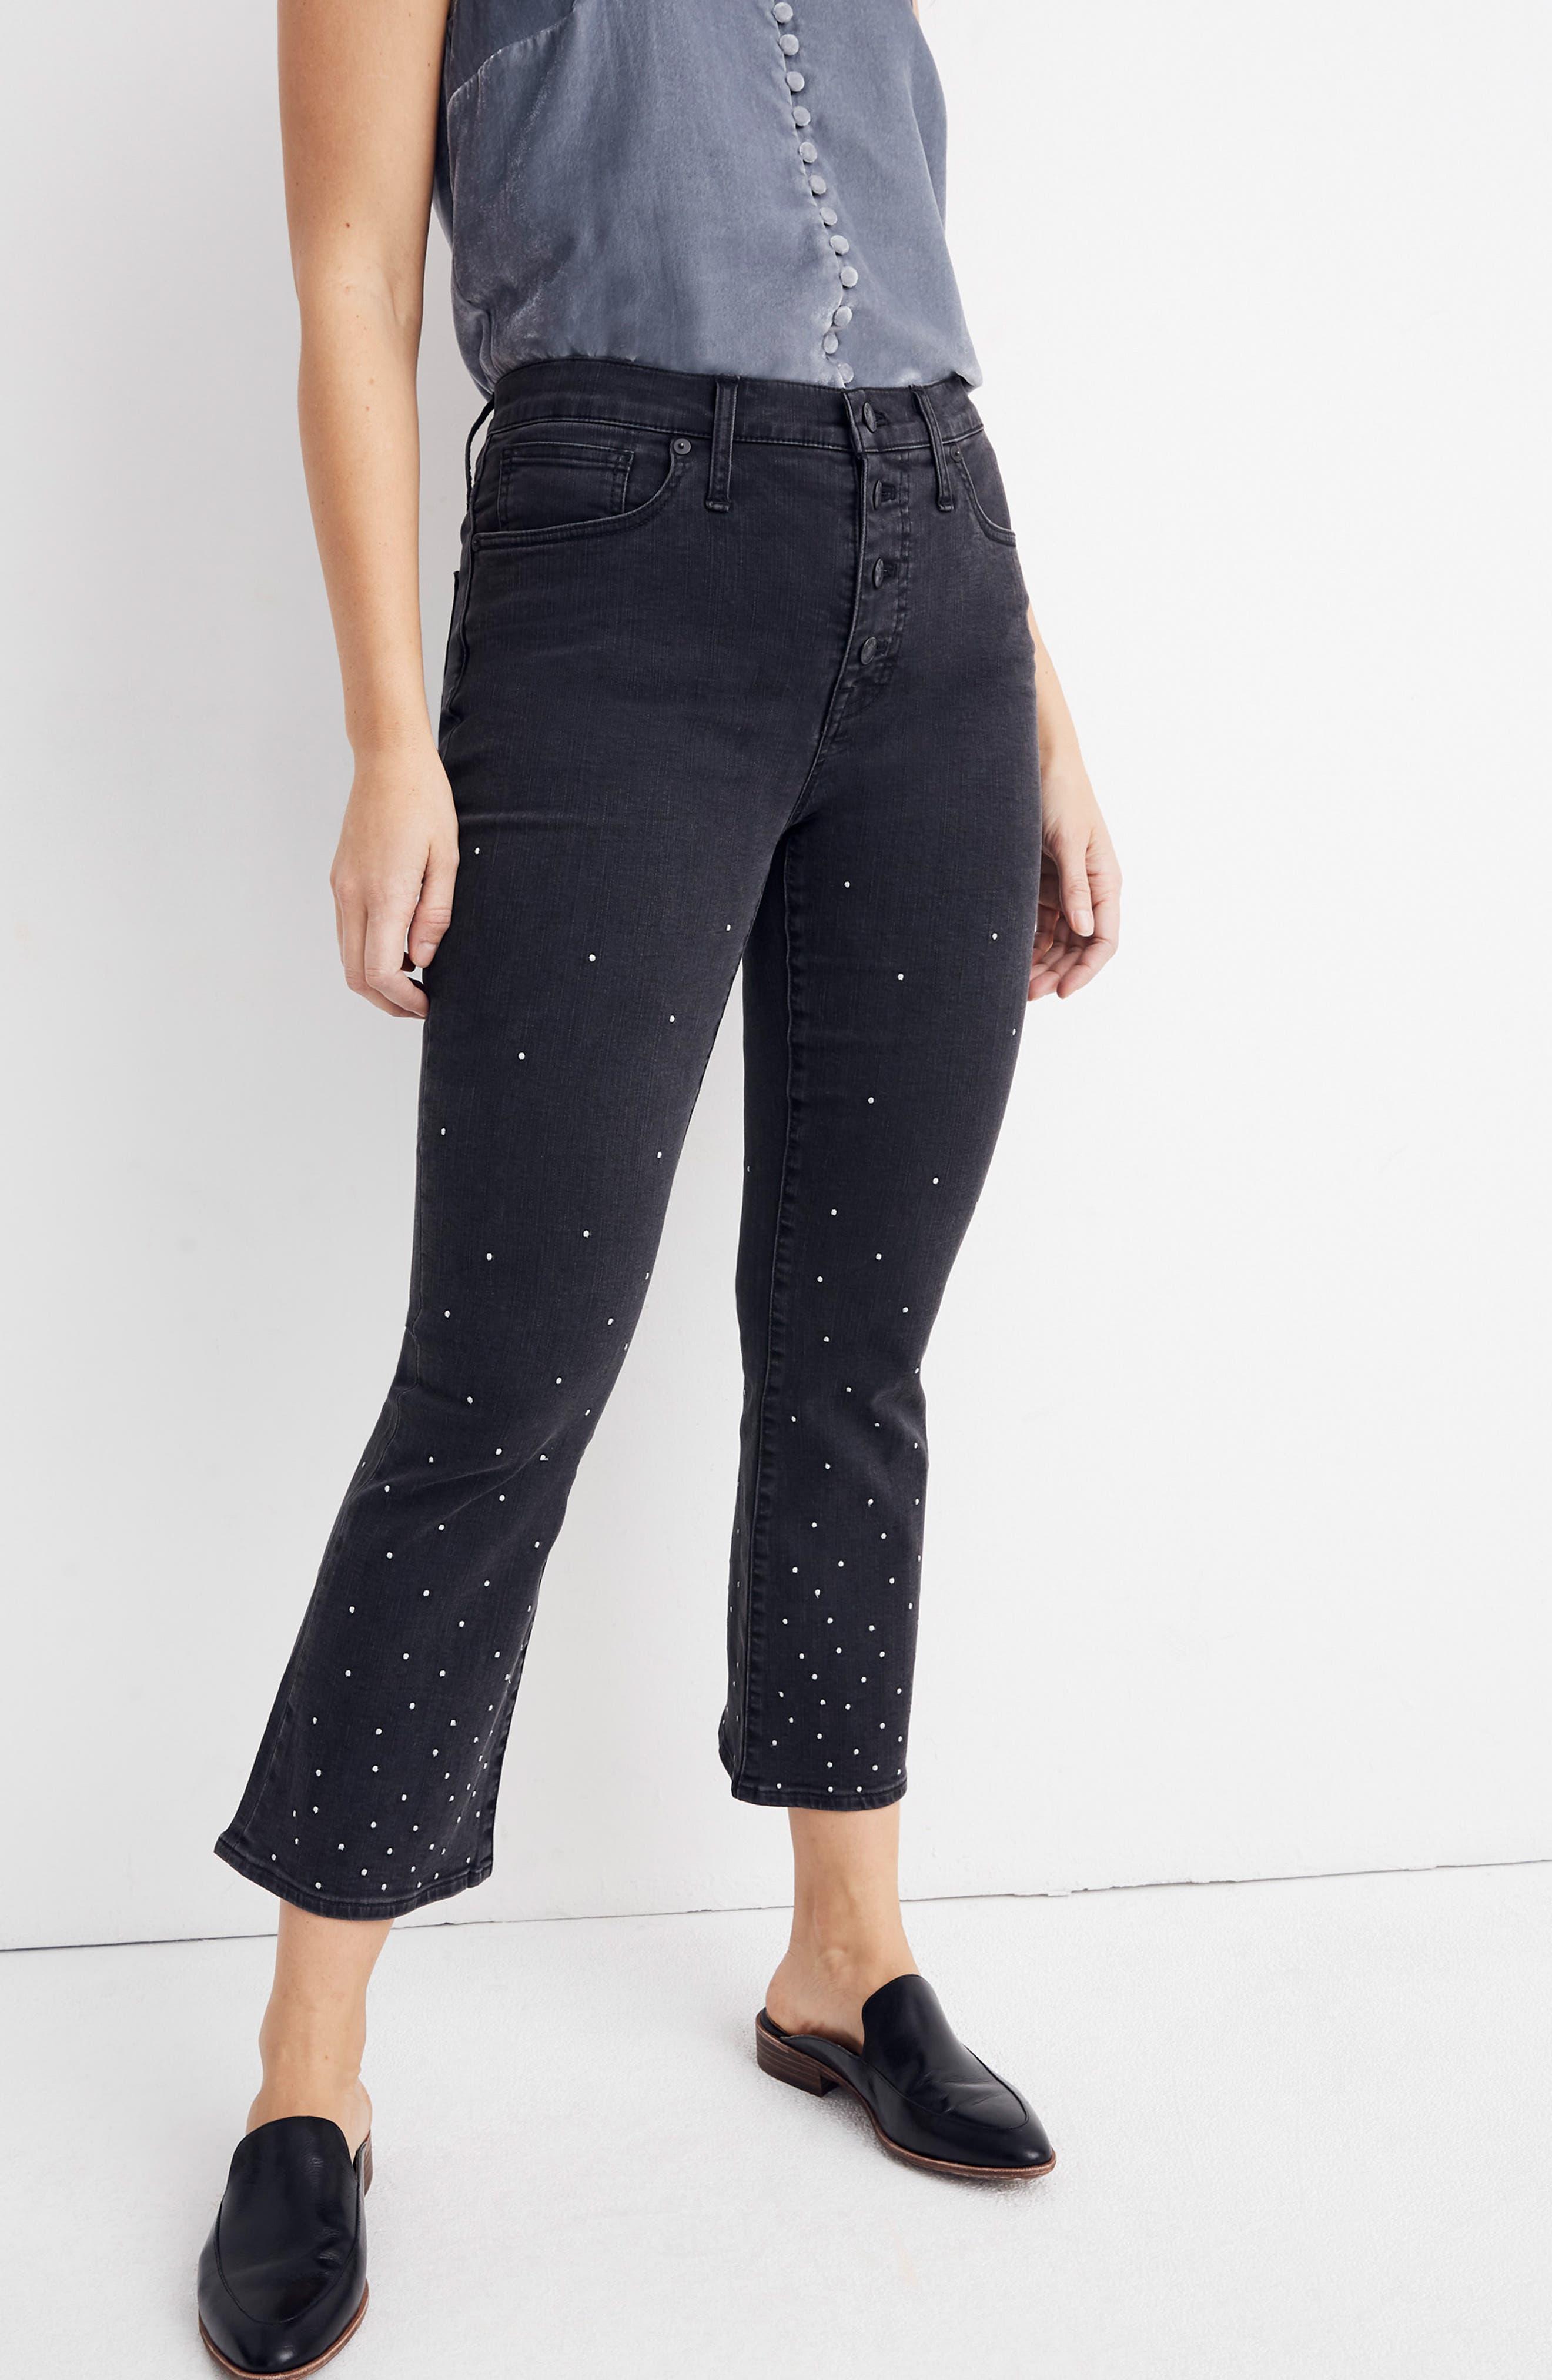 Cali Demi Boot Jeans,                             Alternate thumbnail 10, color,                             SILVER DOTS